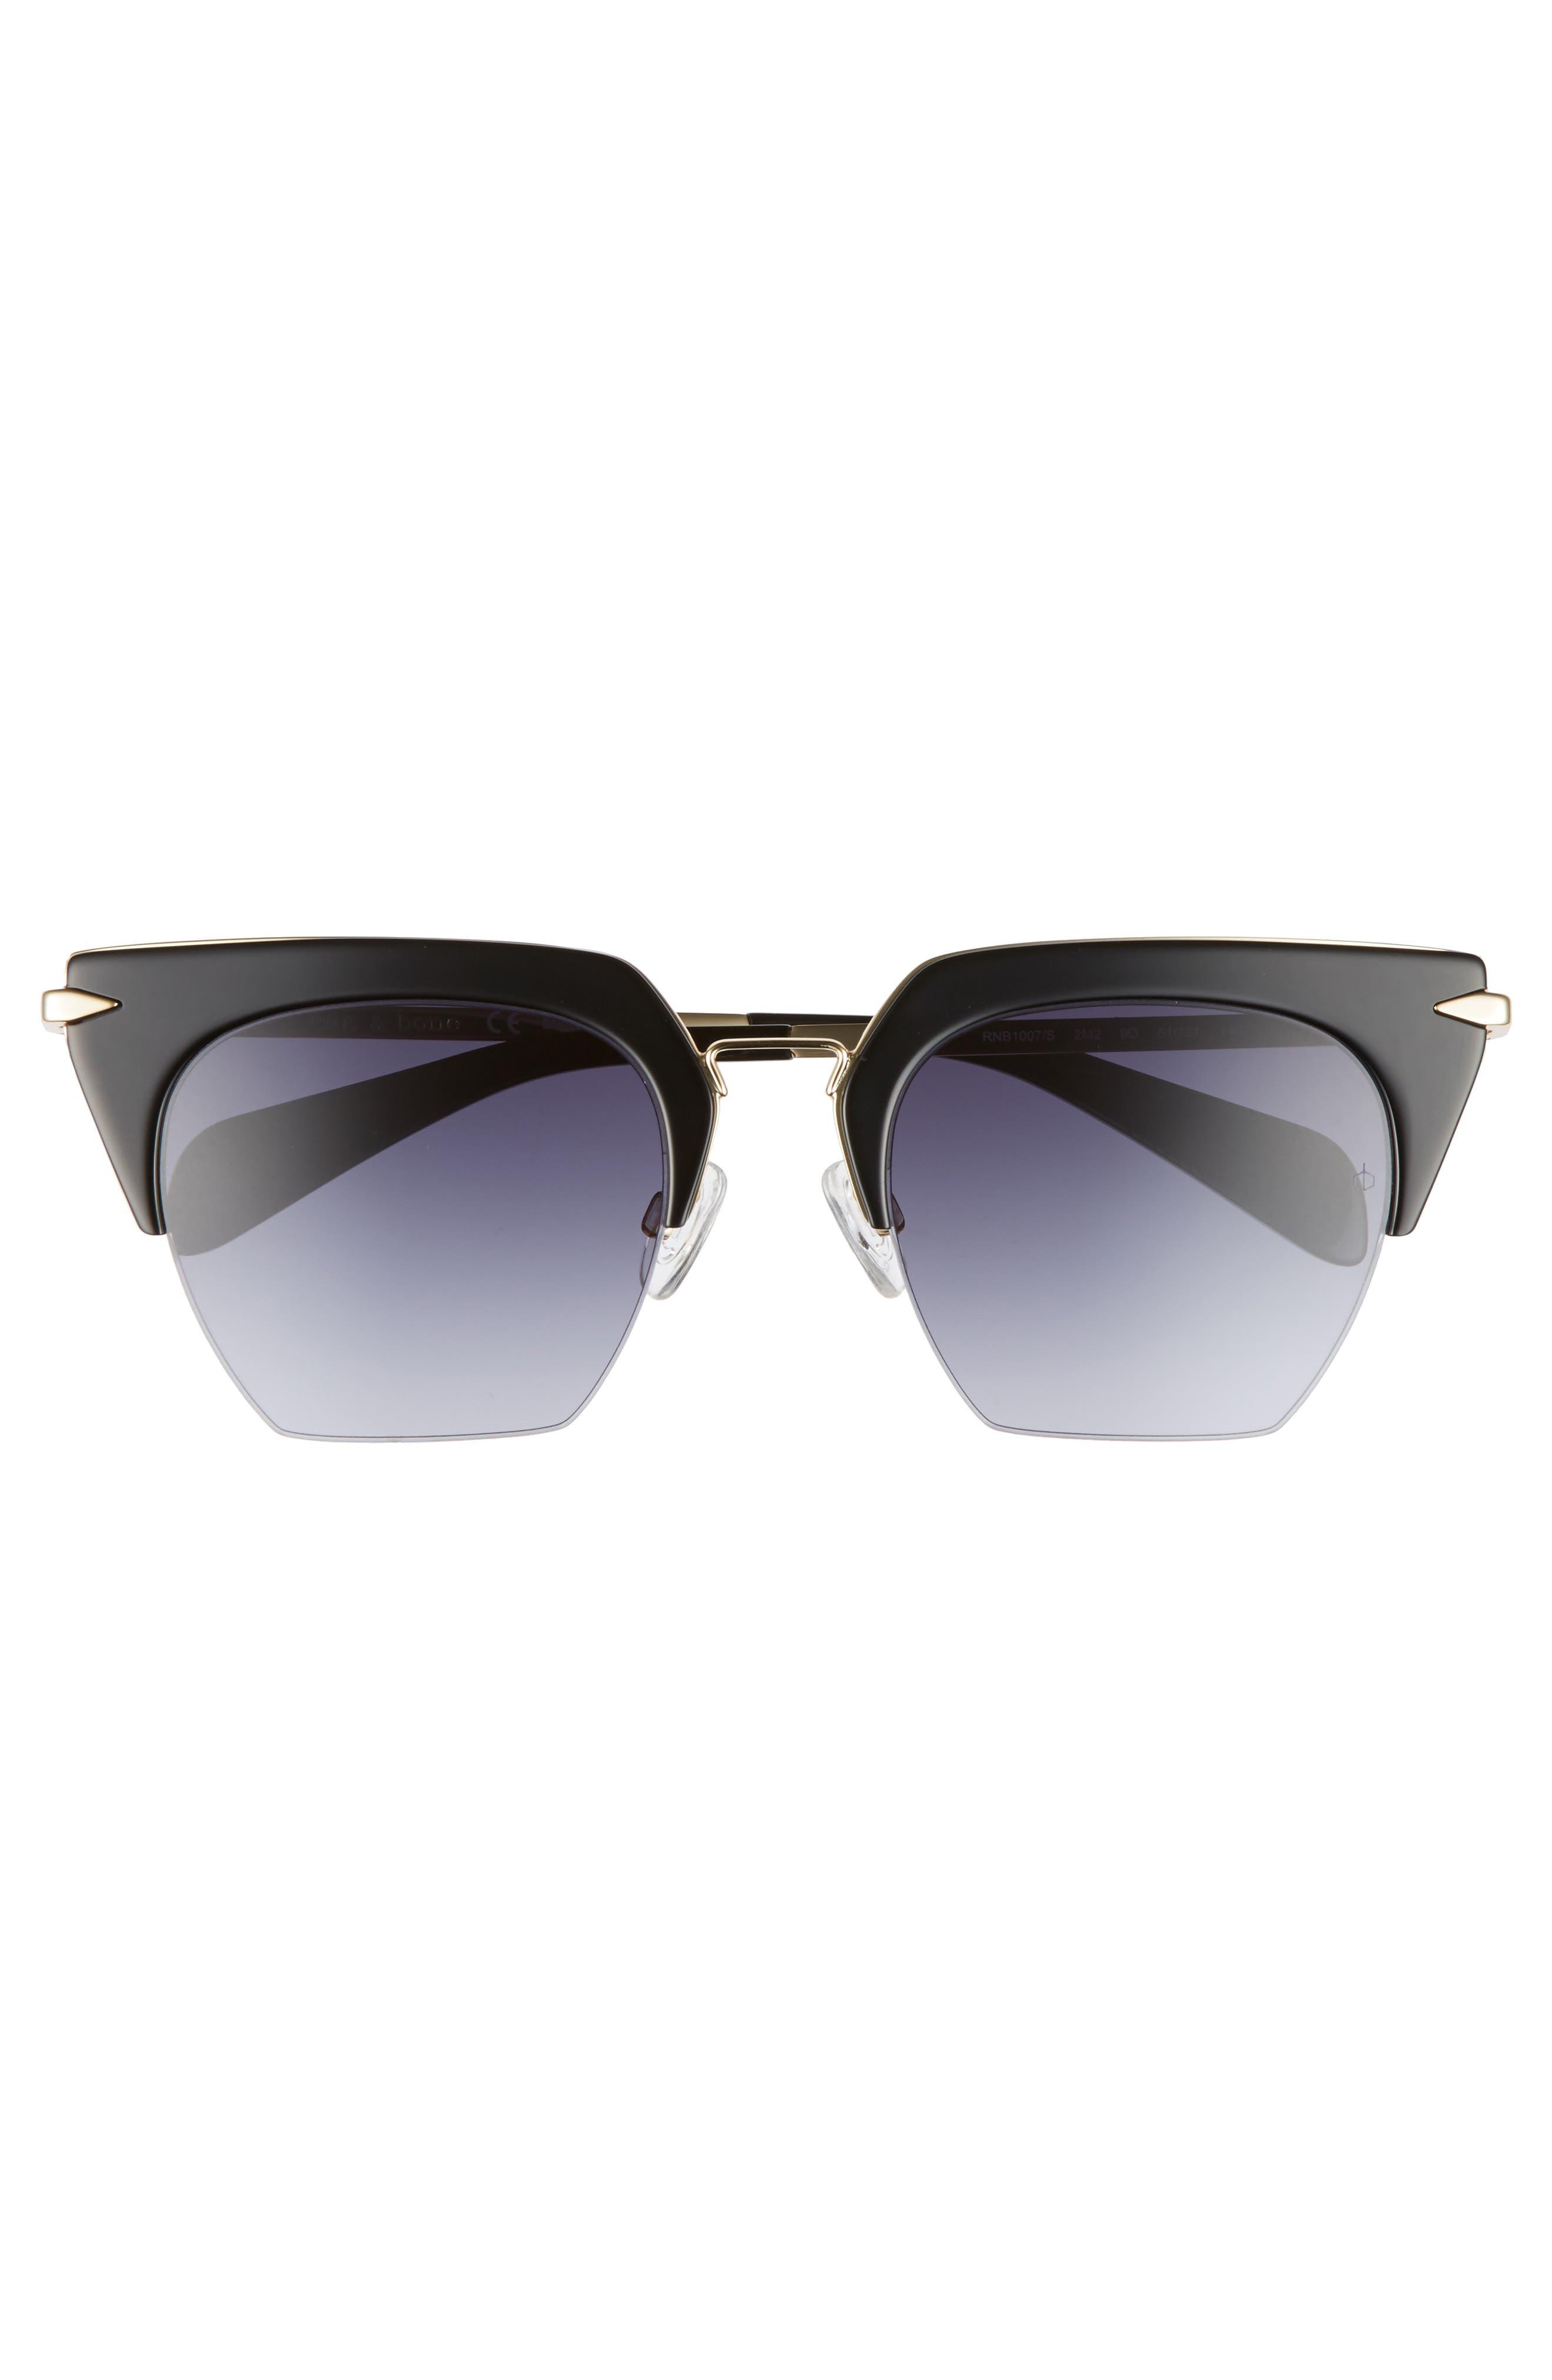 51mm Cat Eye Sunglasses,                             Alternate thumbnail 3, color,                             BLACK/ GOLD